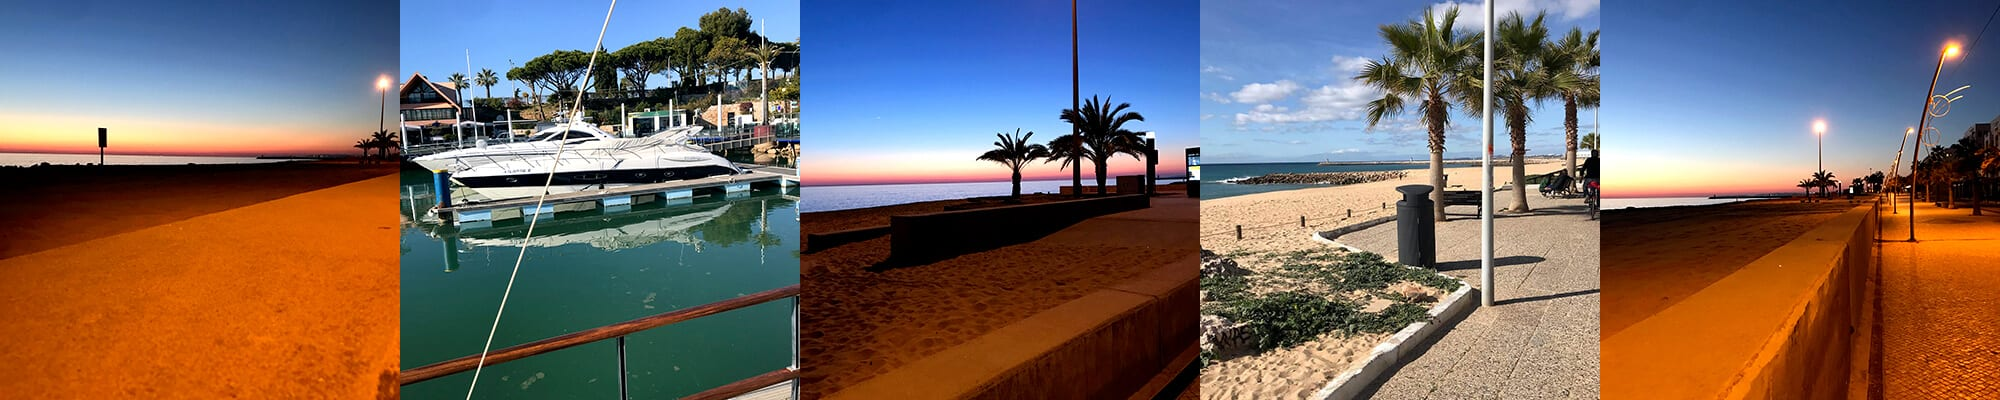 Silva Web Designs - Journey - Beaches